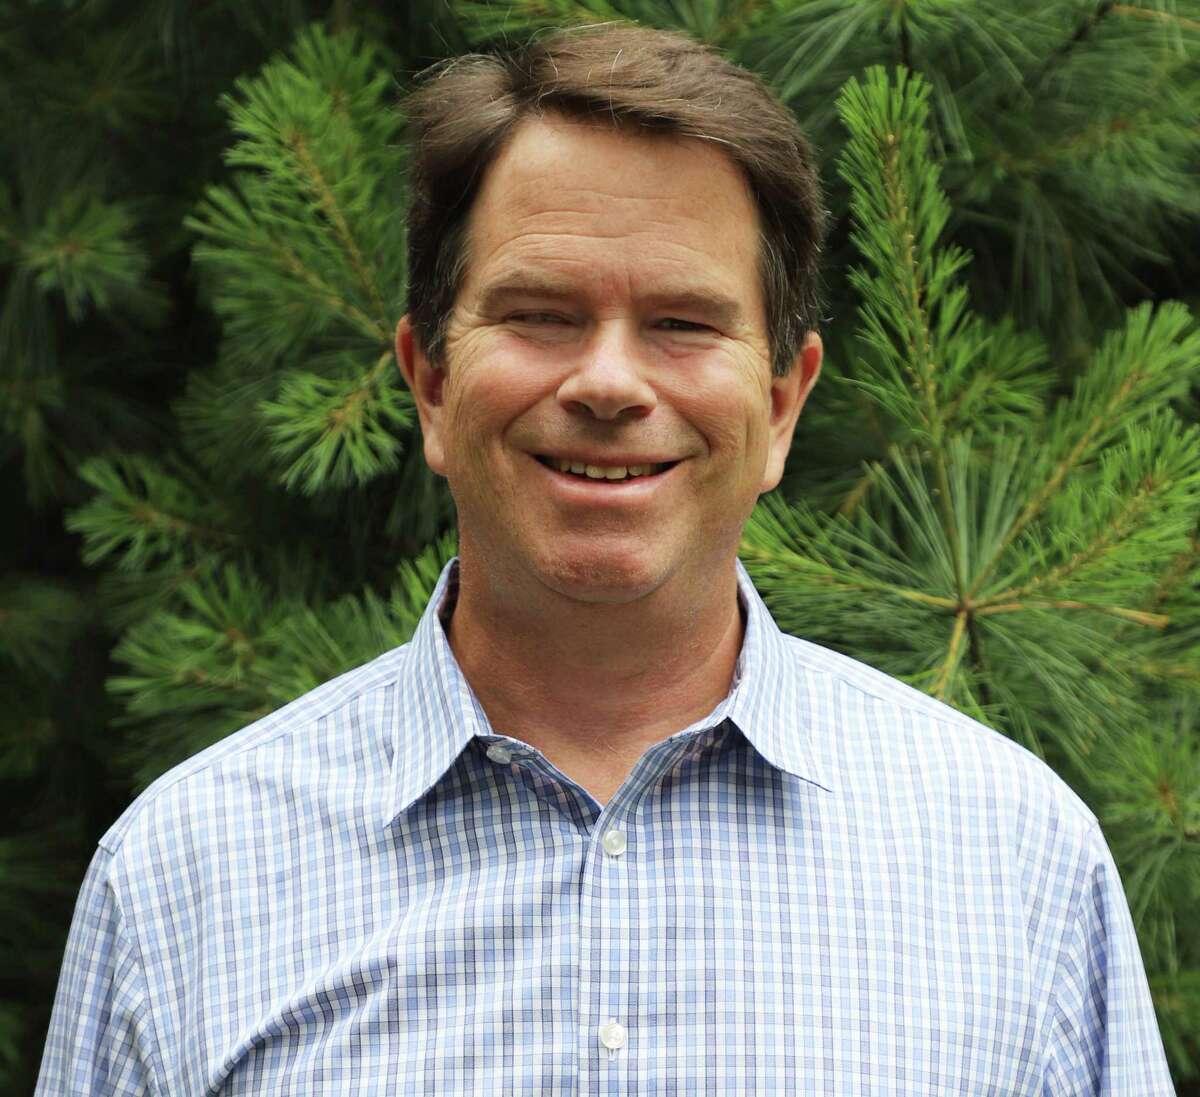 Mark Agnew, a Westport resident, founded Eyeglasses.com in 2000.